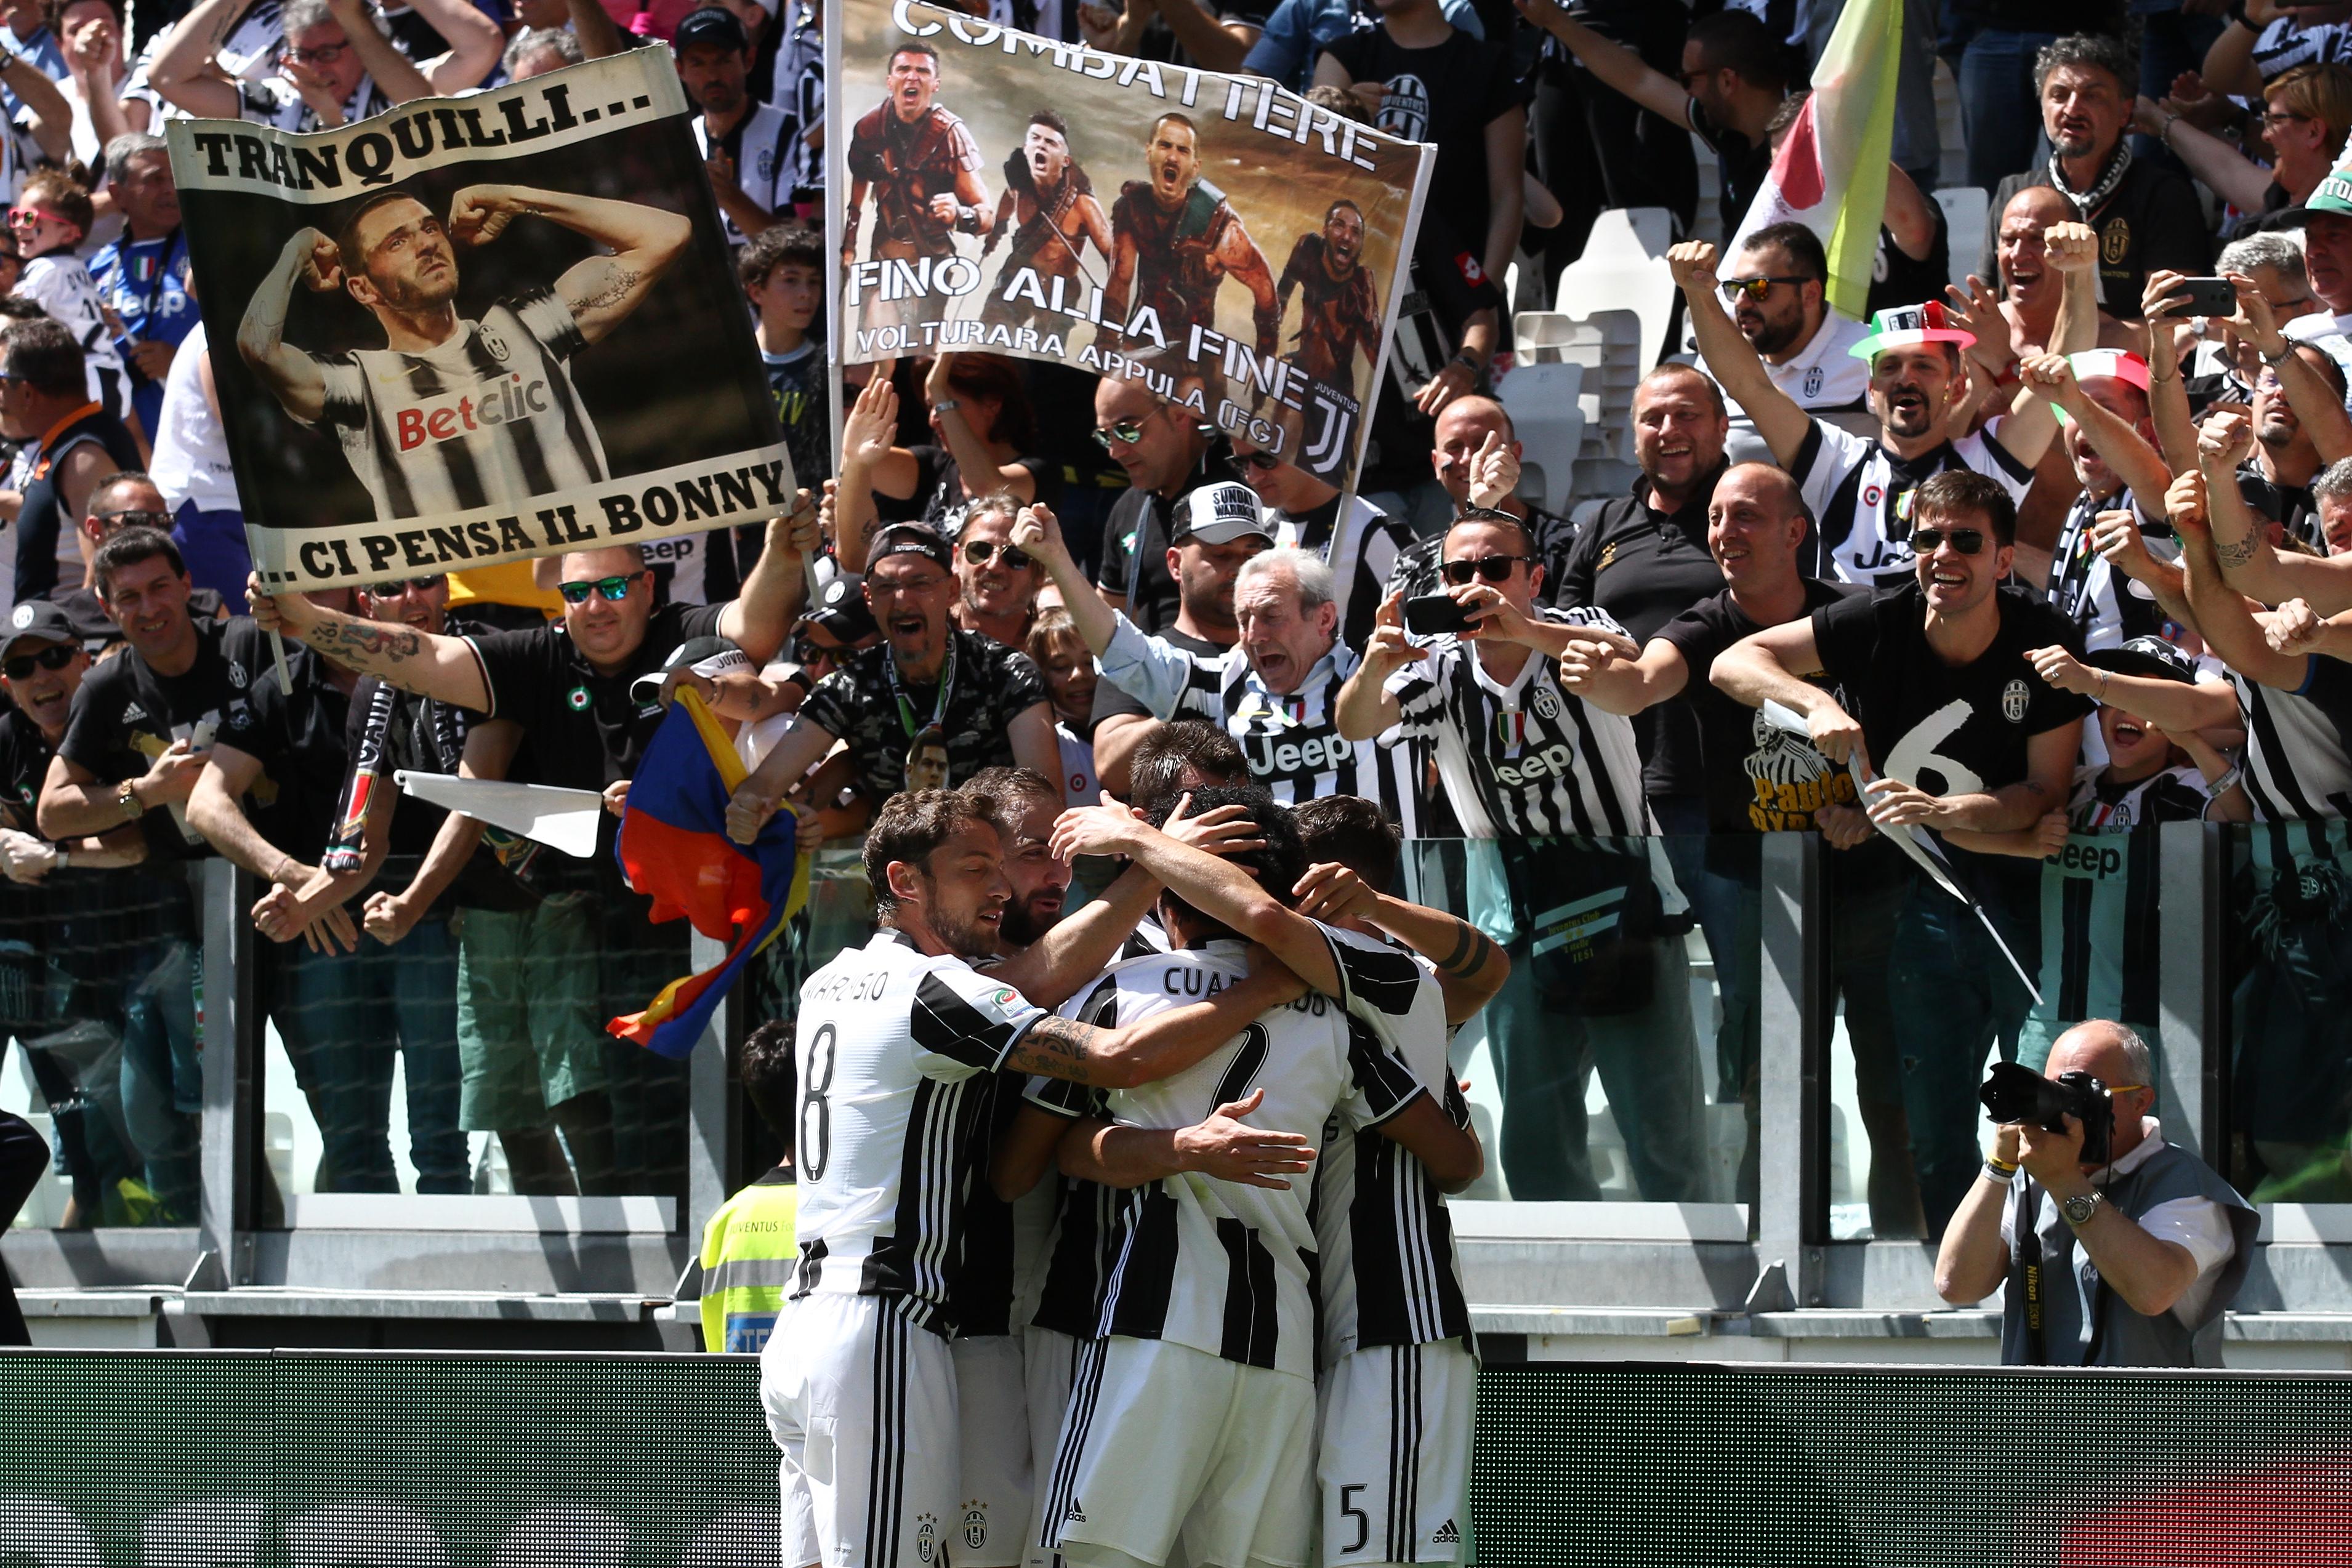 Sorozatban hatodszor olasz bajnok a Juventus